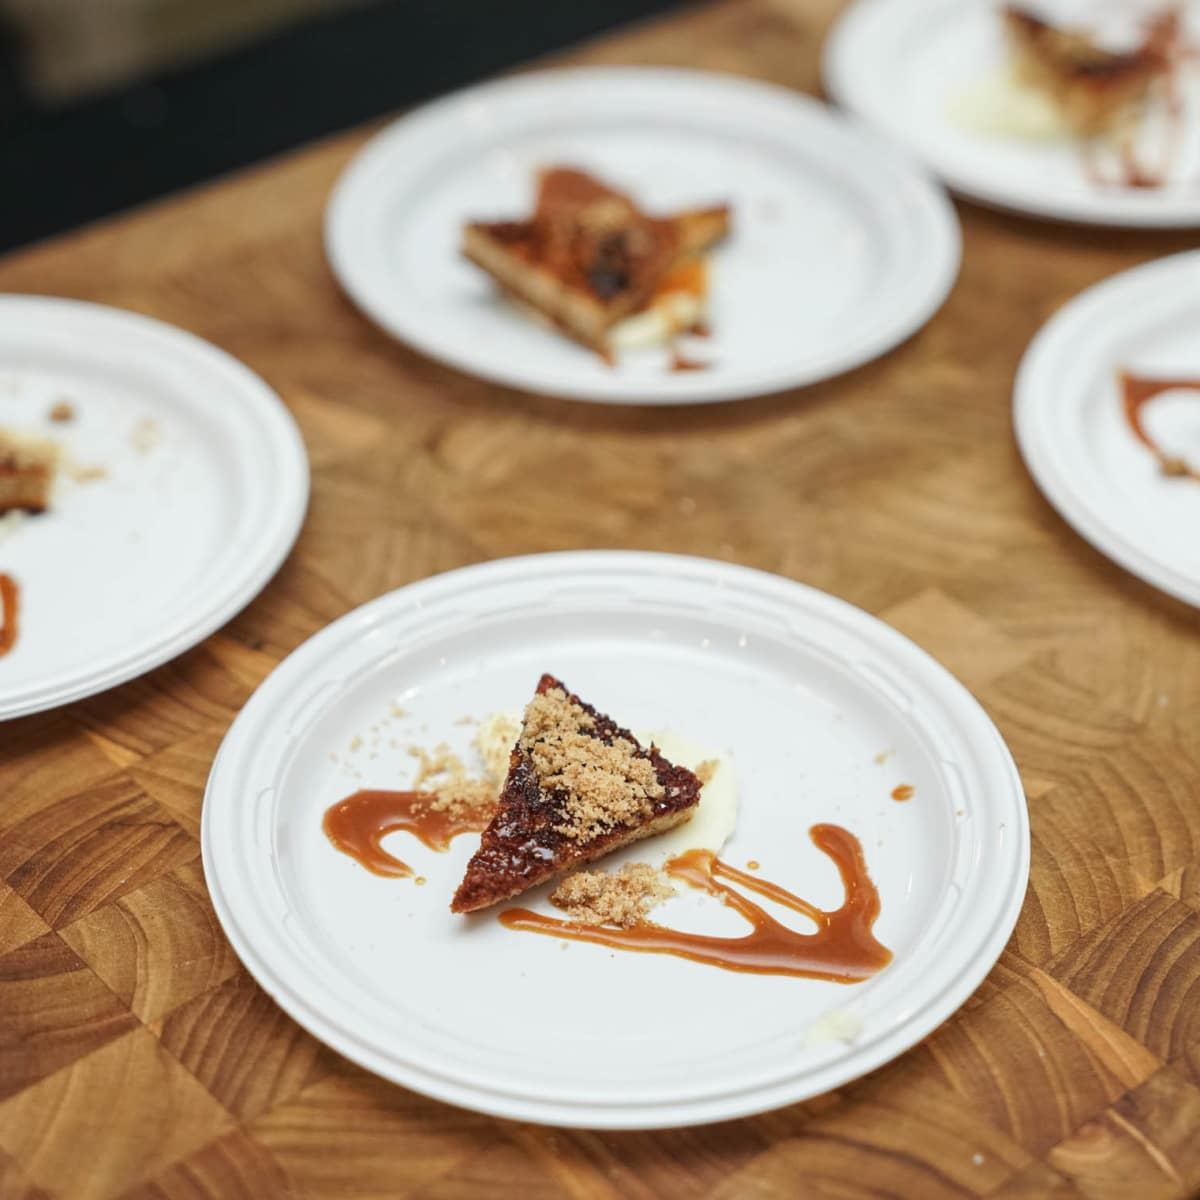 CultureMap Austin 2018 Tastemaker Awards at Fair Market Paperboy Cinnamon Sugar Streusal